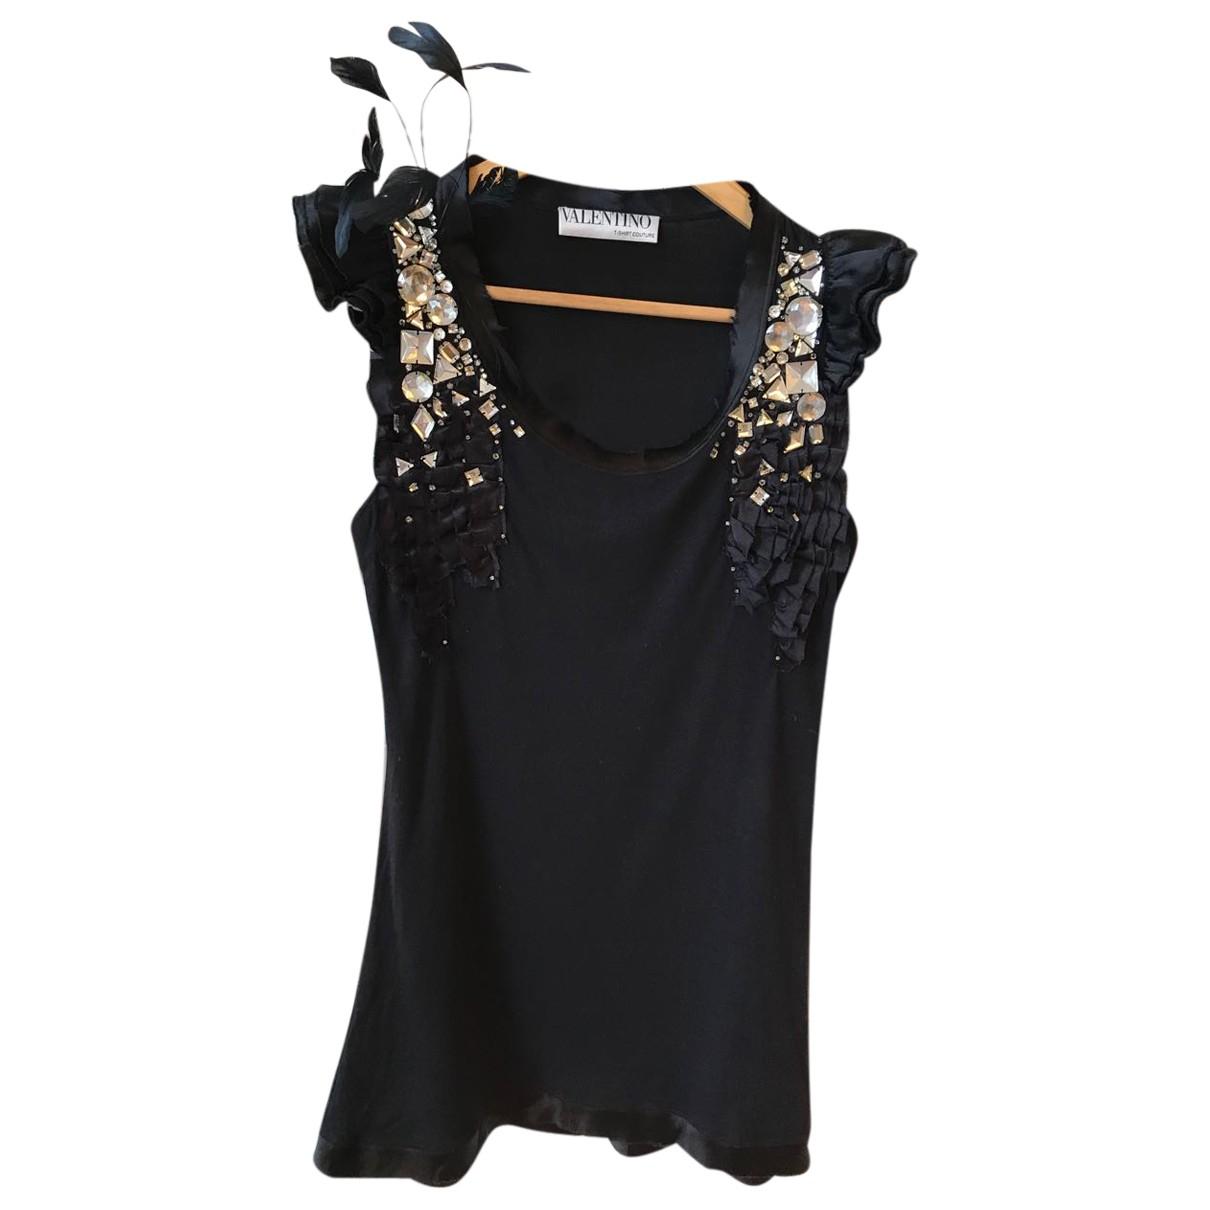 Valentino Garavani N Black  top for Women 6 UK